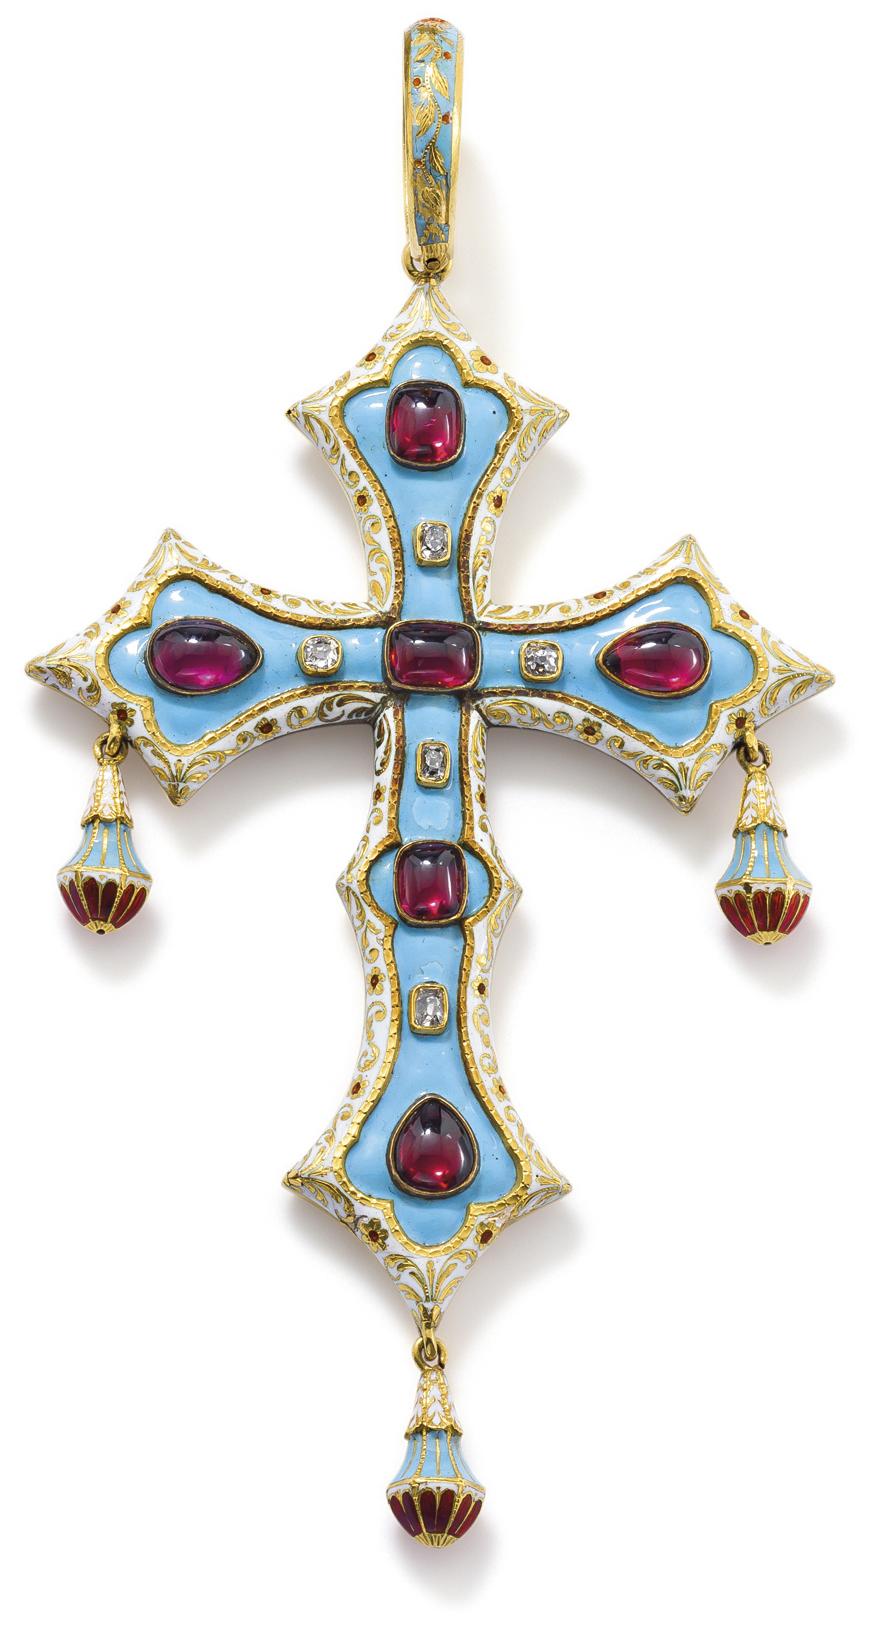 A rubellite and enamel cross pendant the opaque light blue enamel